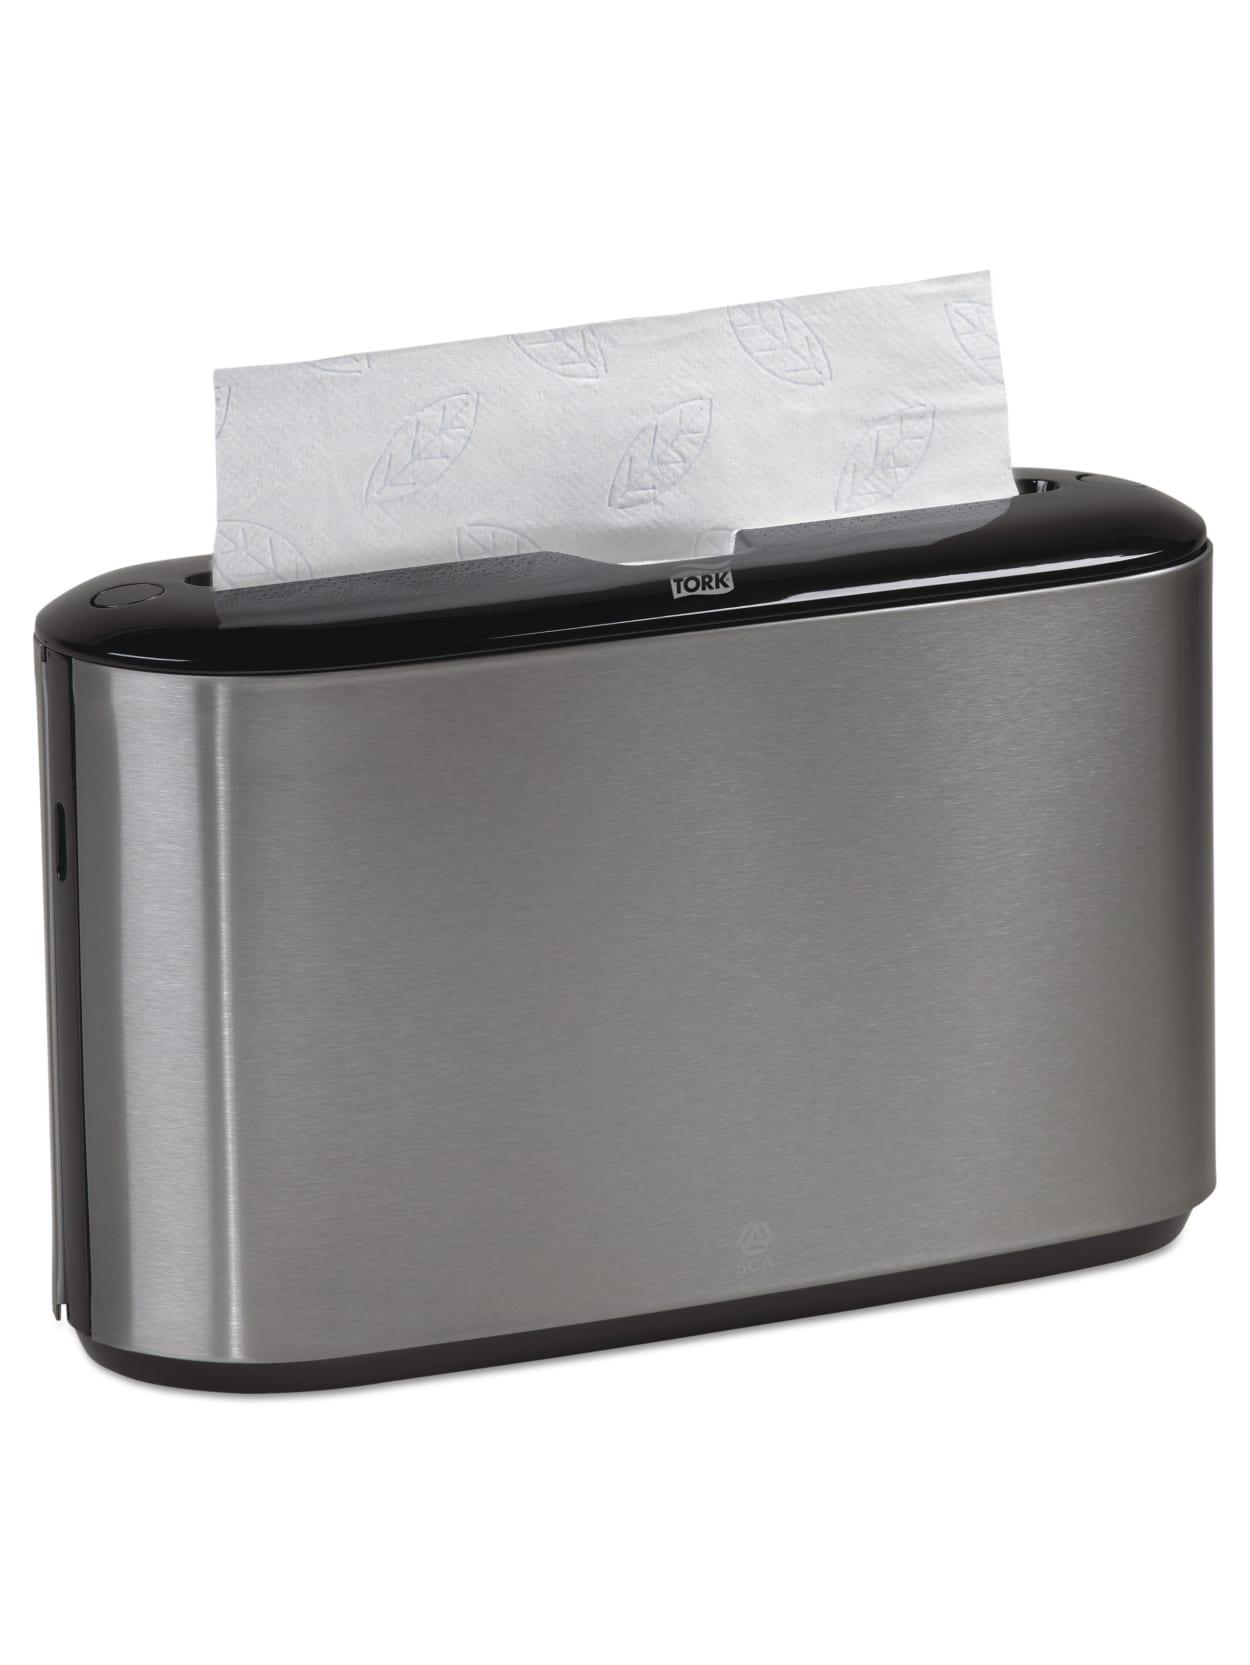 Picture of: Tork Xpress Countertop Towel Dispenser Blackstainless Steel Office Depot